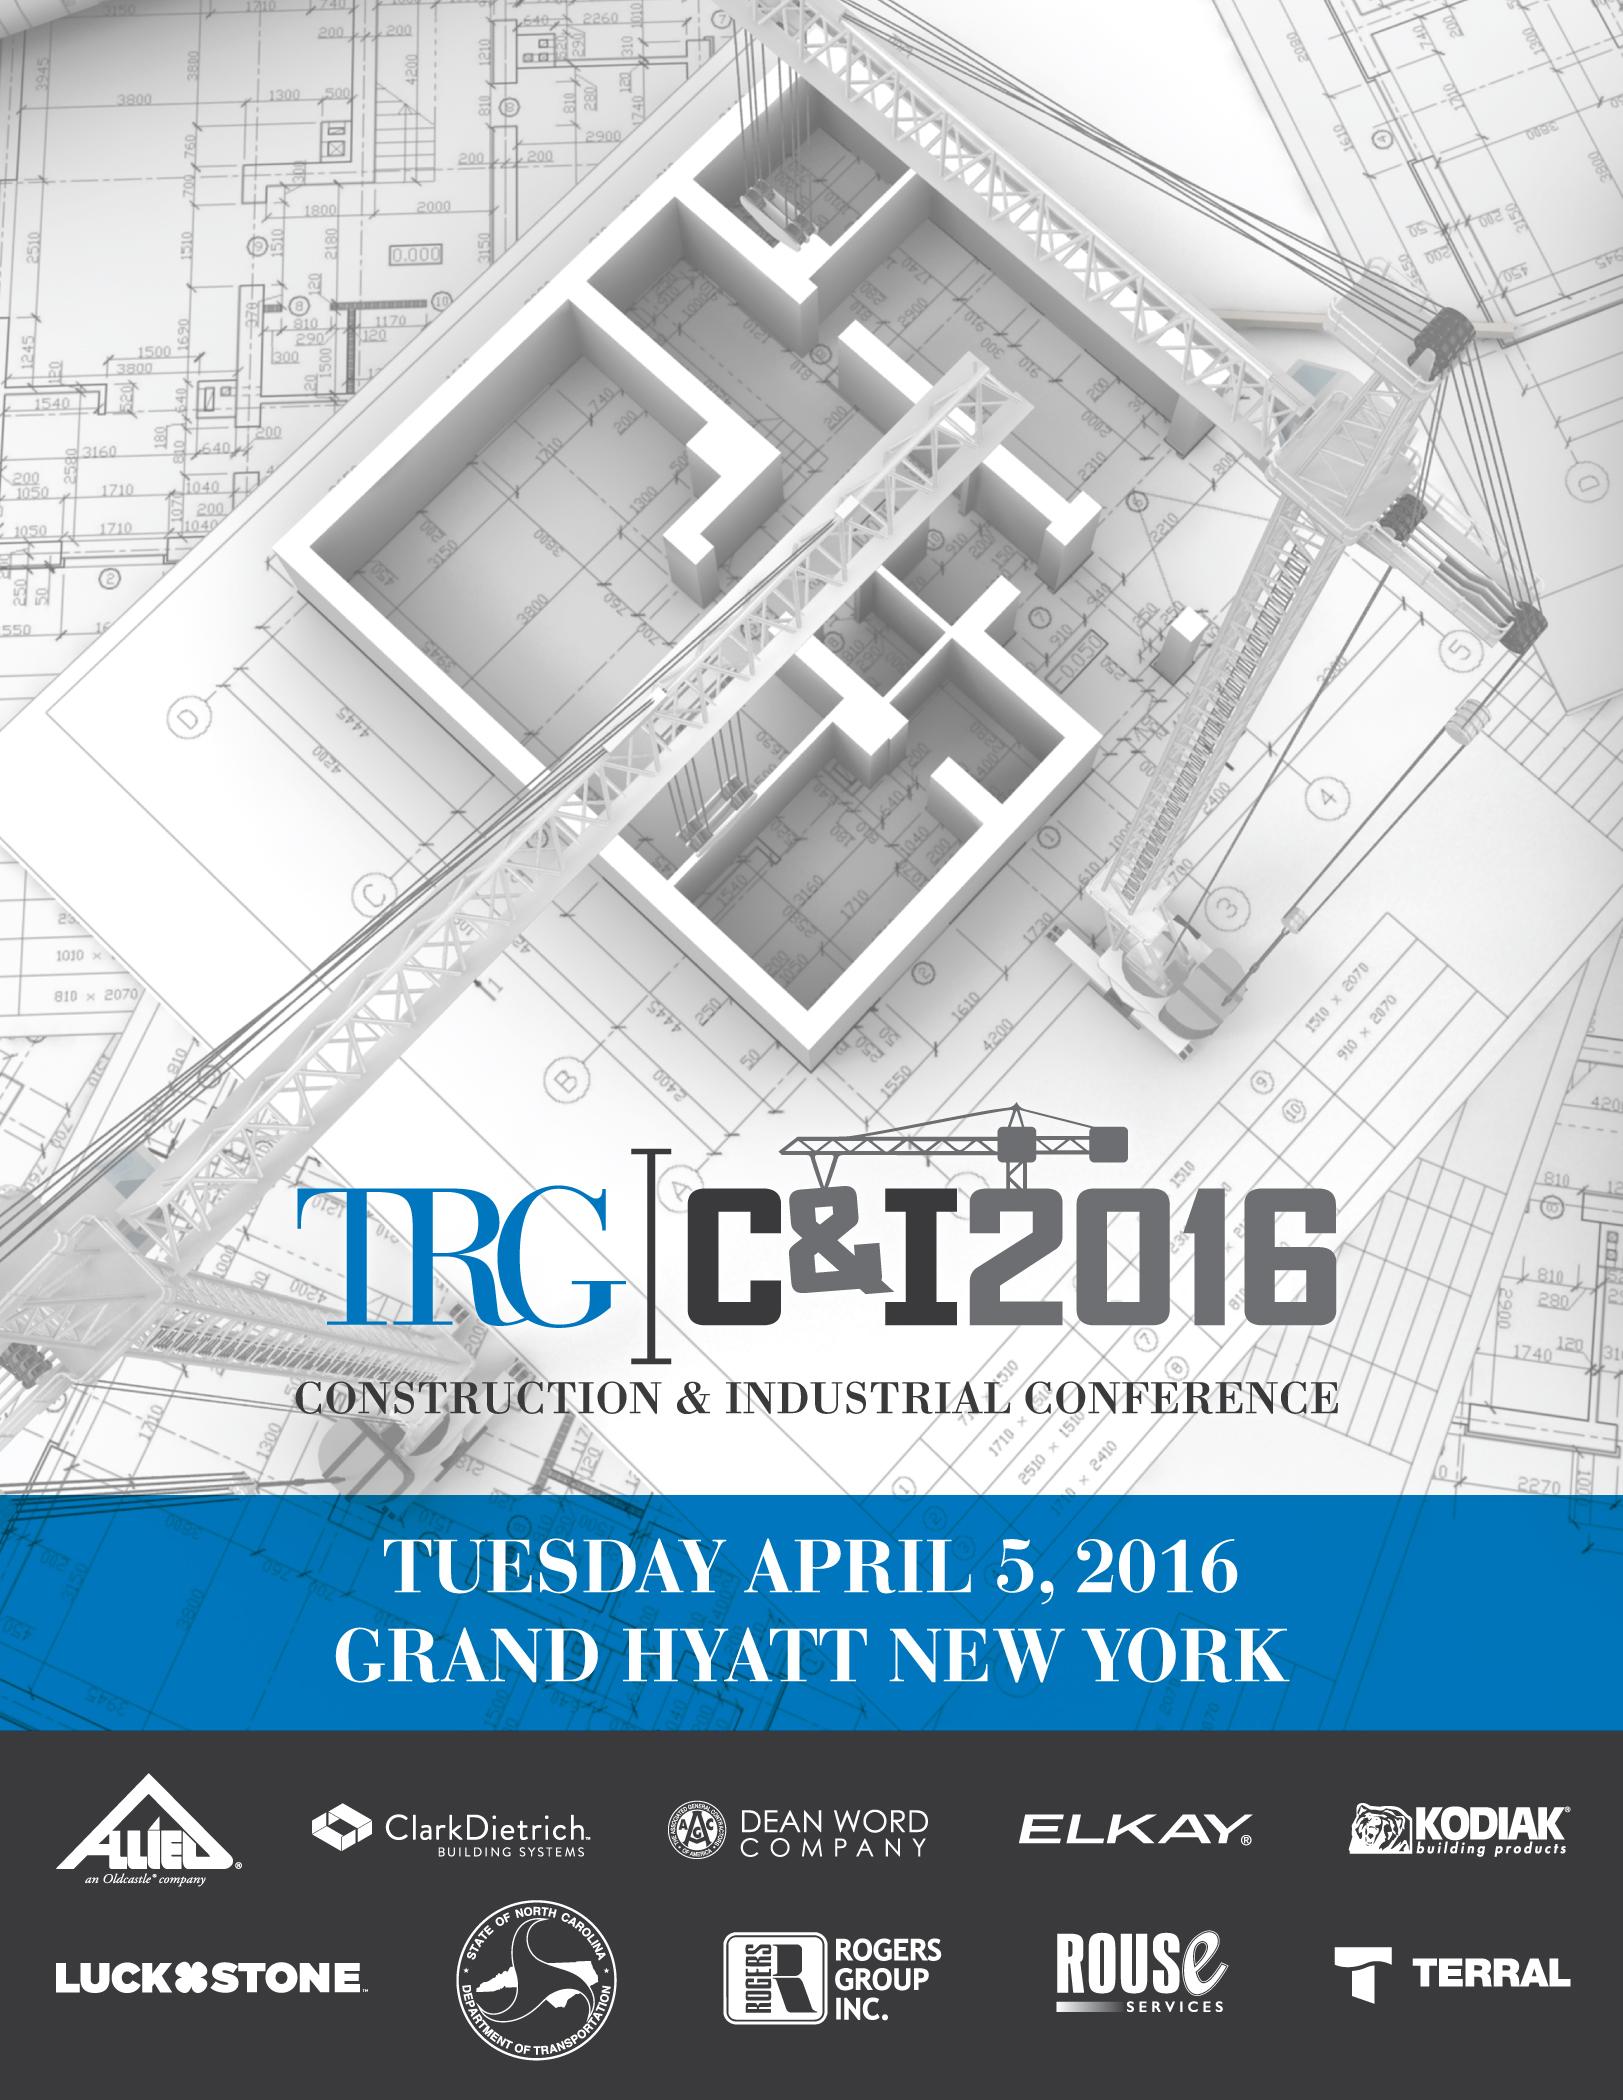 TRG_CI2016_Binder-Cover_A_FINAL.jpg